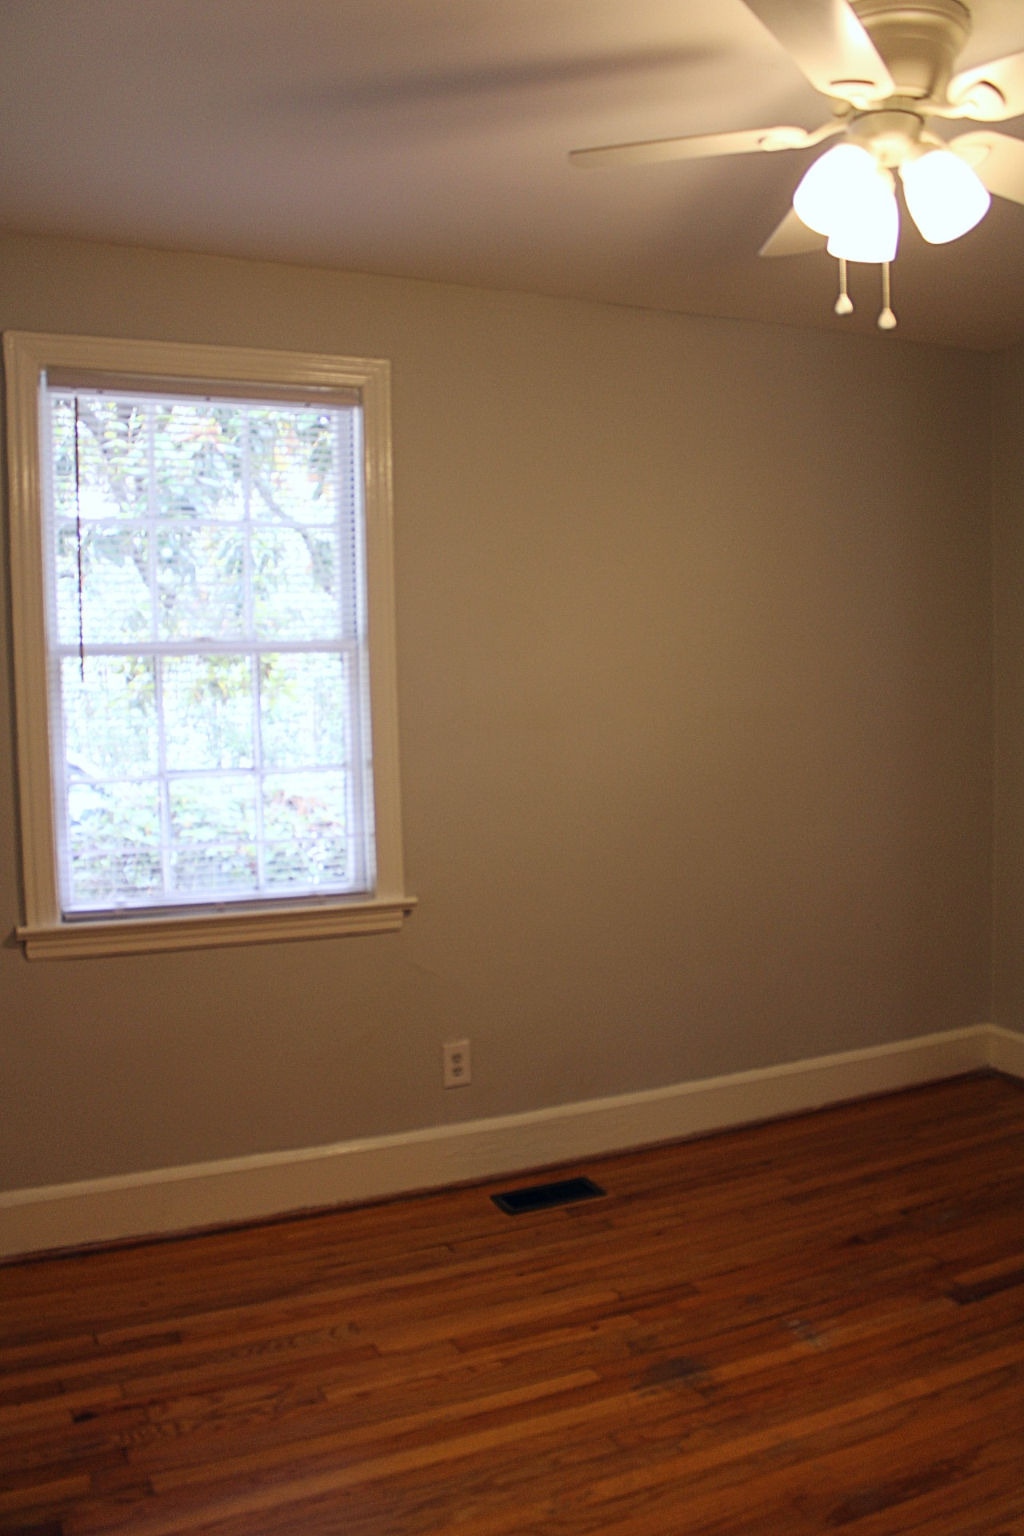 3425 Prentice Avenue,Columbia,South Carolina 29205,2 Bedrooms Bedrooms,1 BathroomBathrooms,Apartment,Prentice Avenue,1365